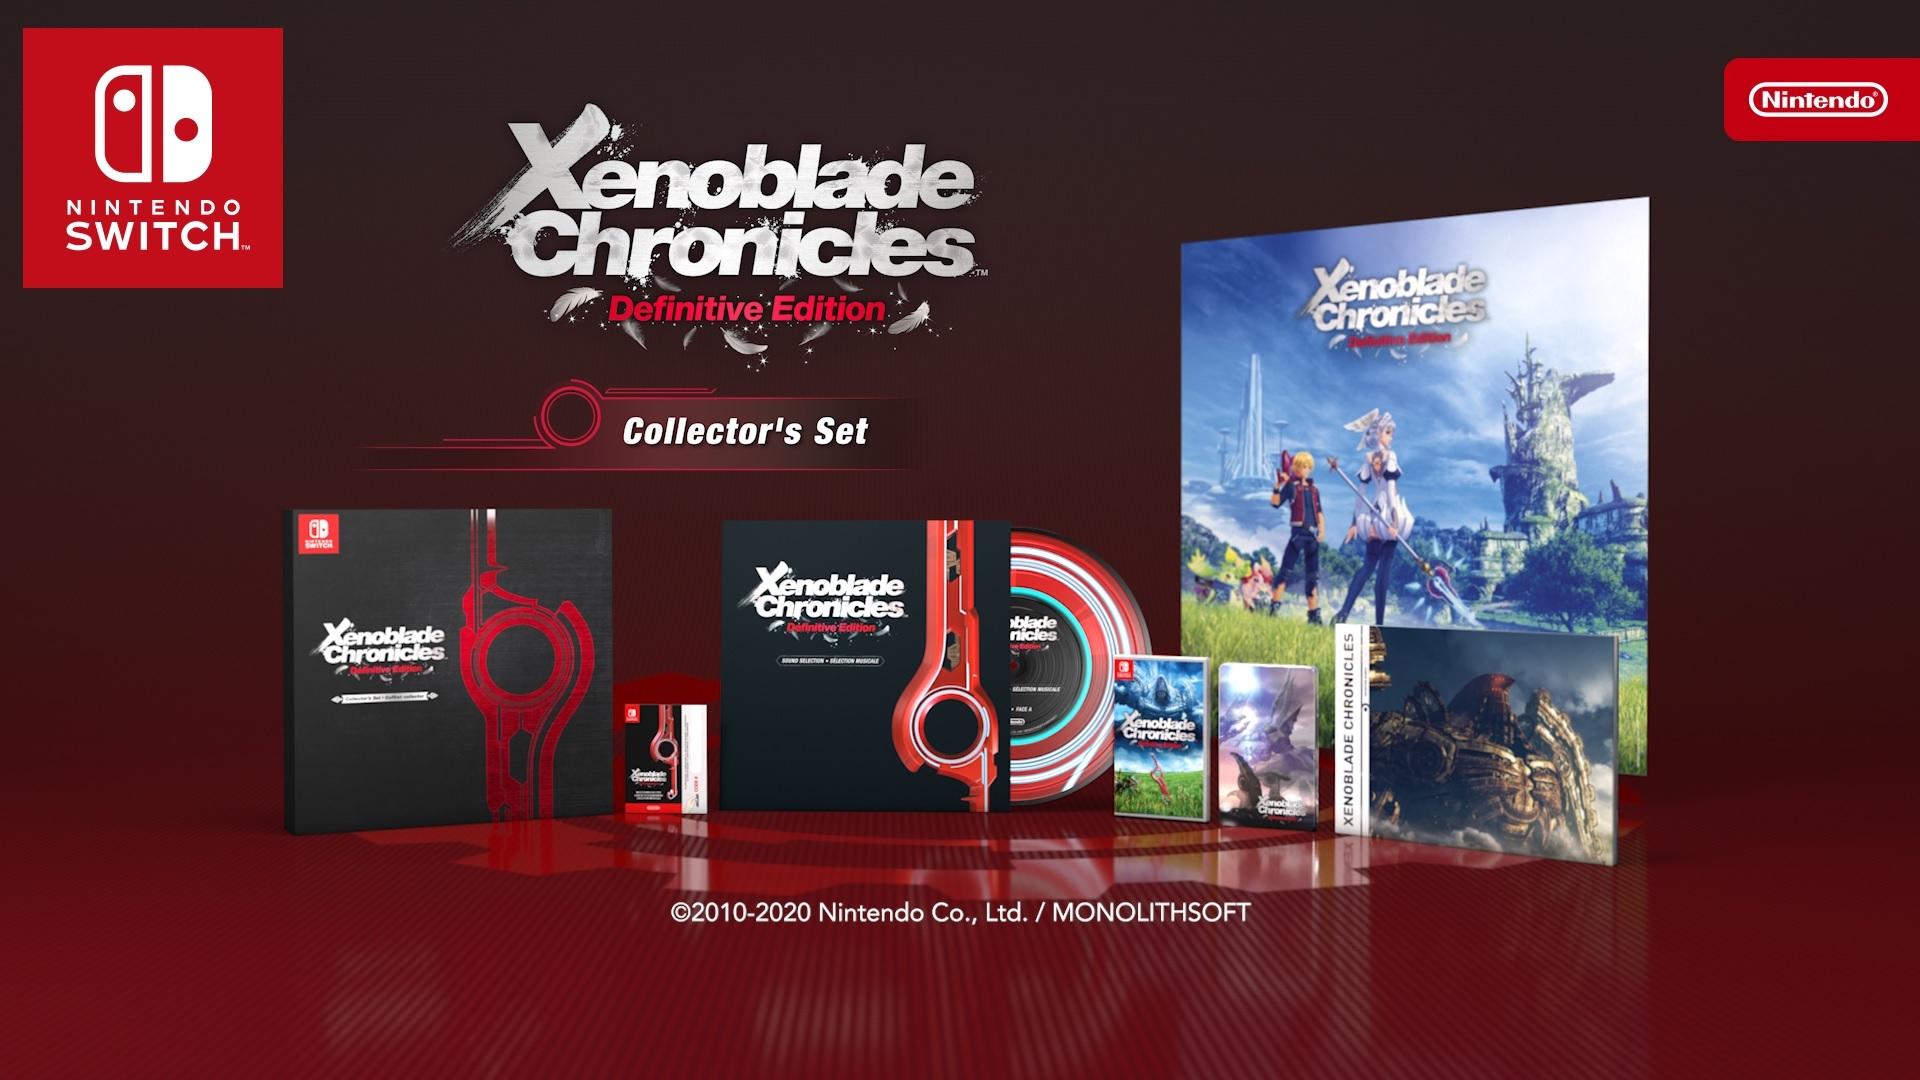 Коллекционное издание Xenoblade Chronicles Definitive Edition Collector's Set